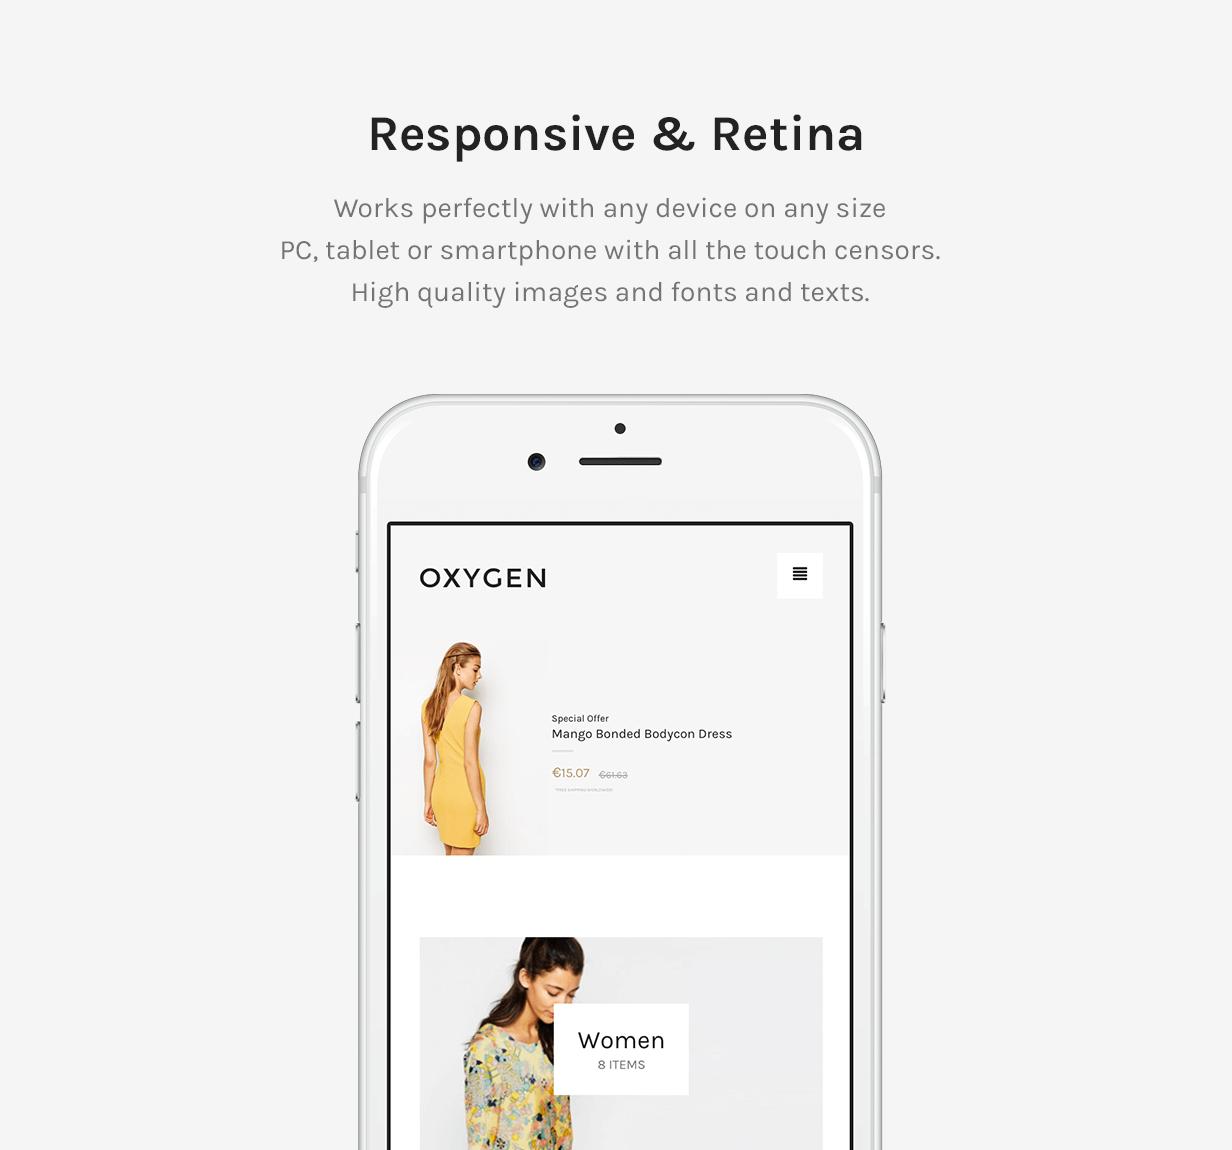 Responsive and Retina